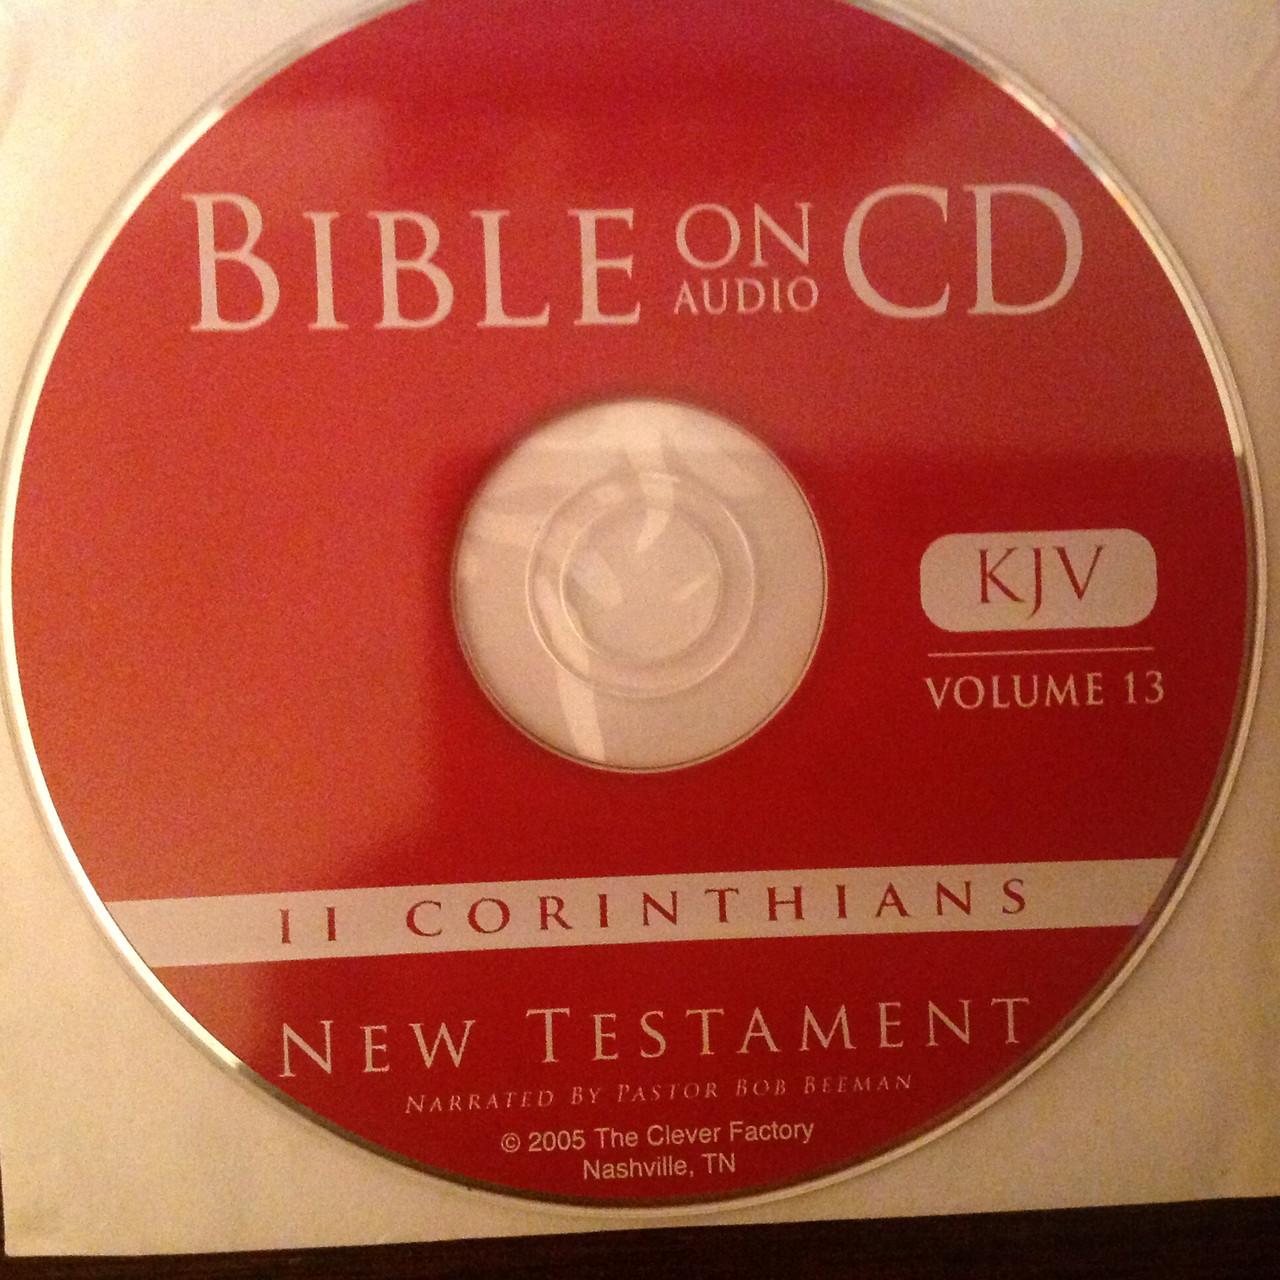 Bible on Audio CD, Vol. 13, II Corinthians CD